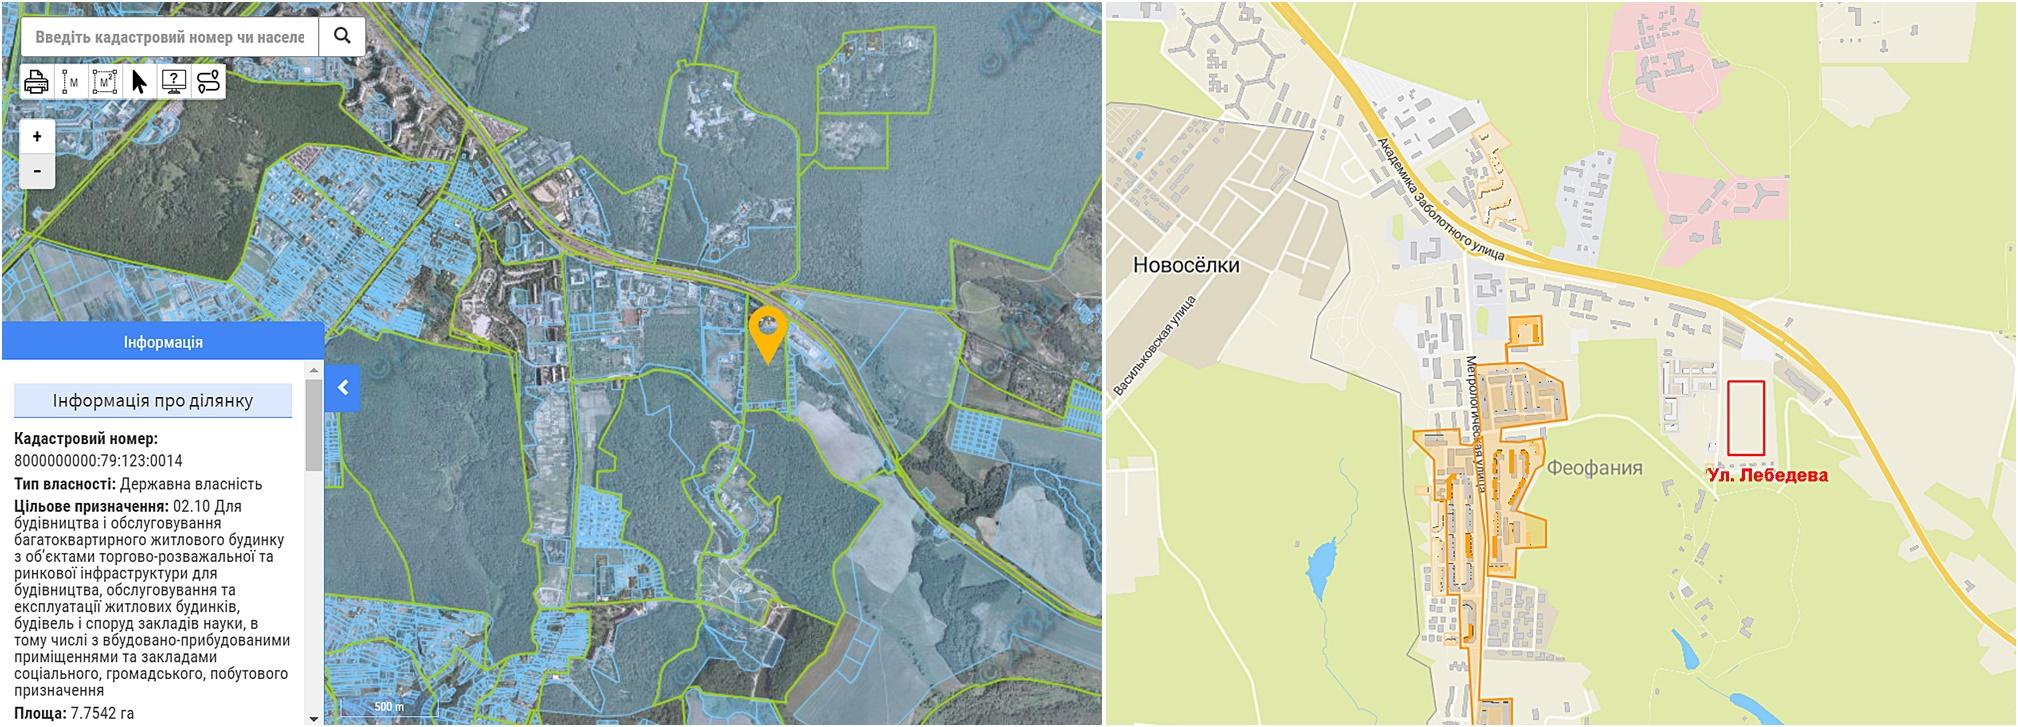 Проект по ул. Лебедева данные кадастра и на карте